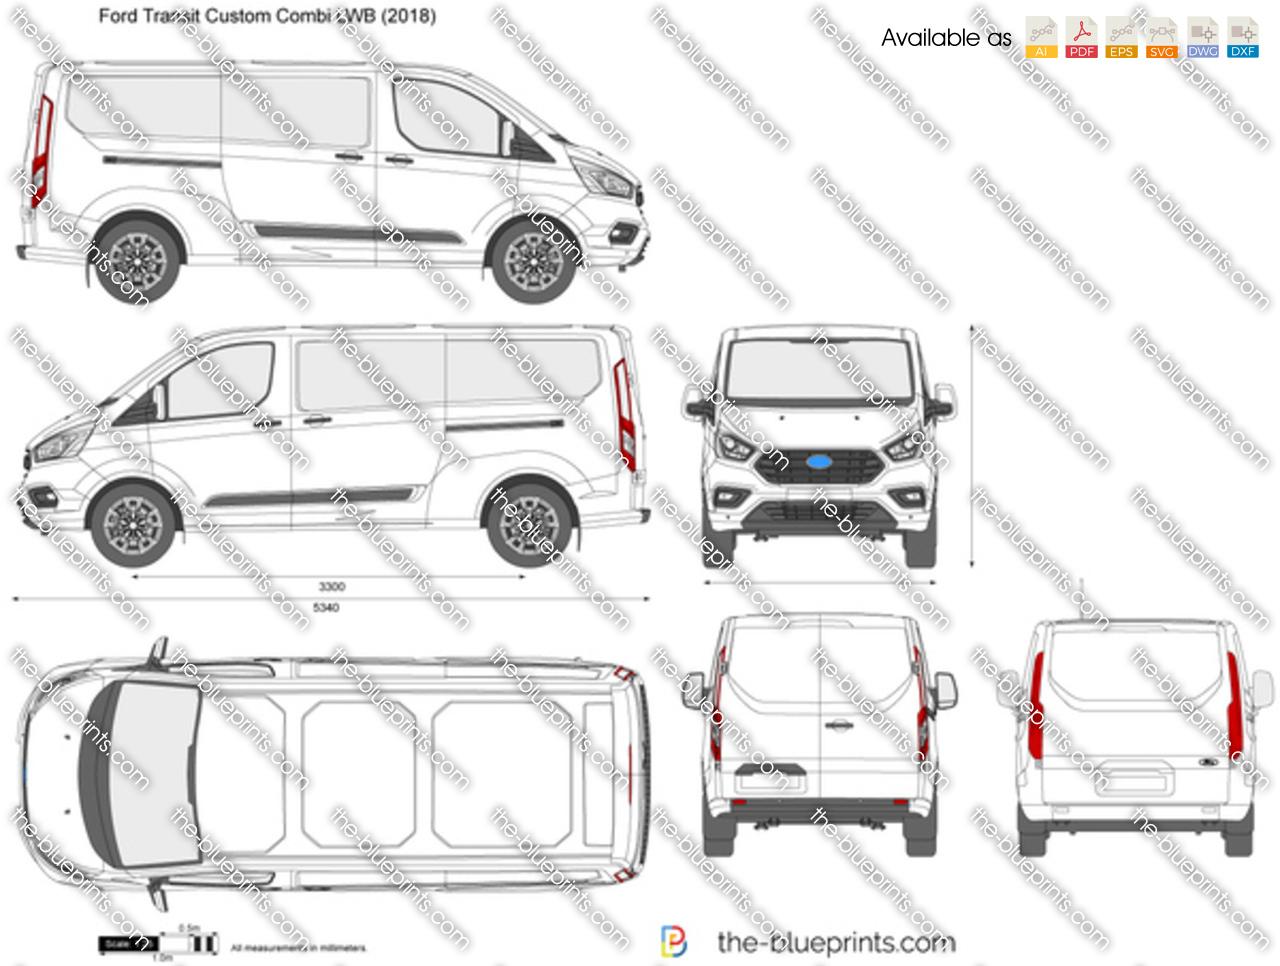 Ford Transit Custom Combi LWB